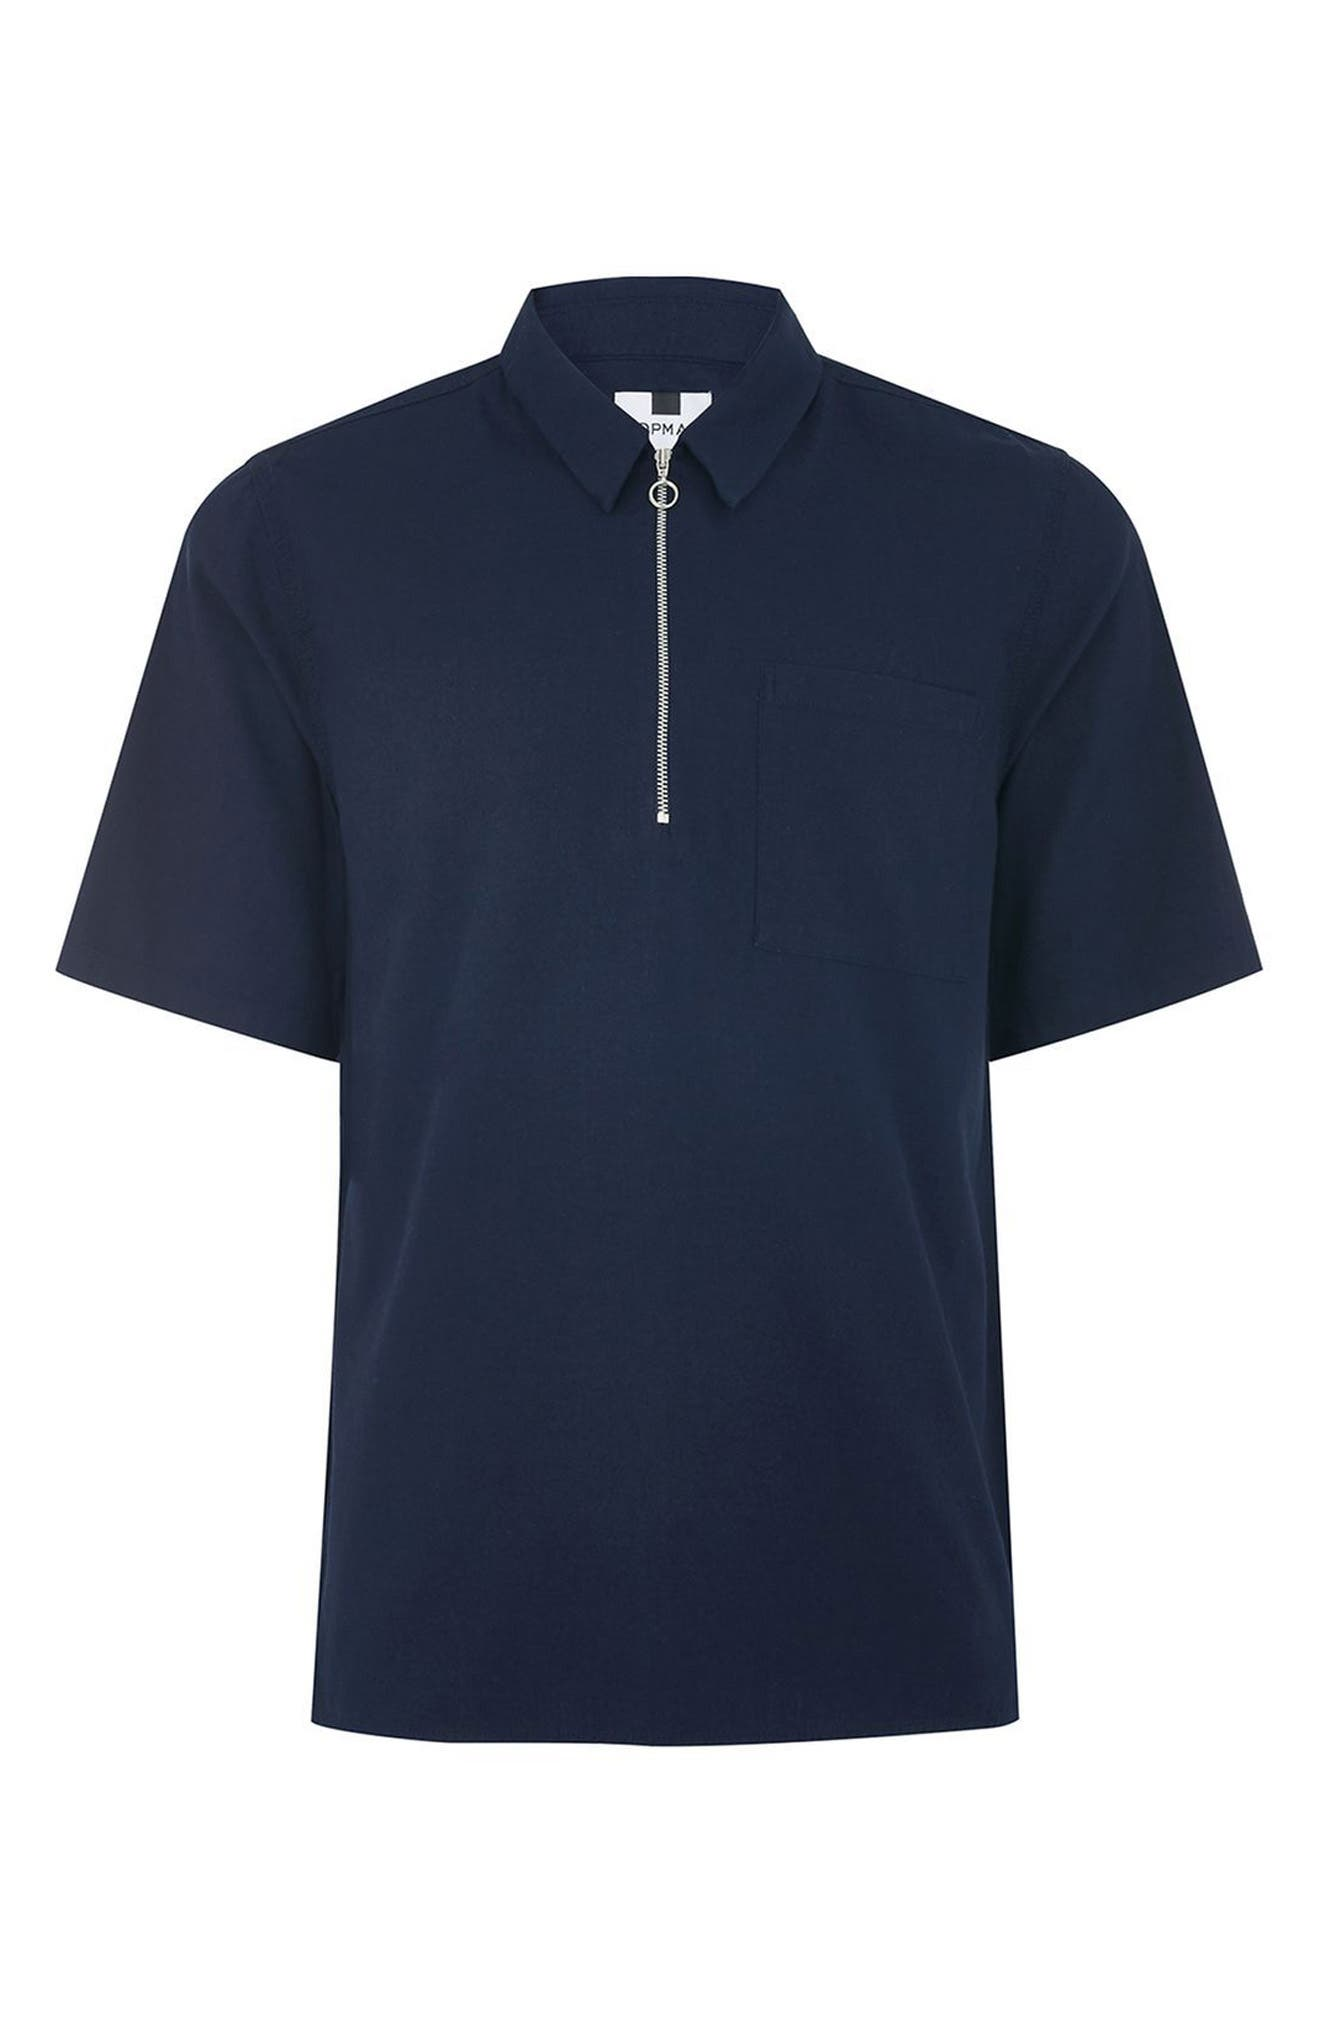 Modern Fit Zip Shirt,                             Alternate thumbnail 4, color,                             410